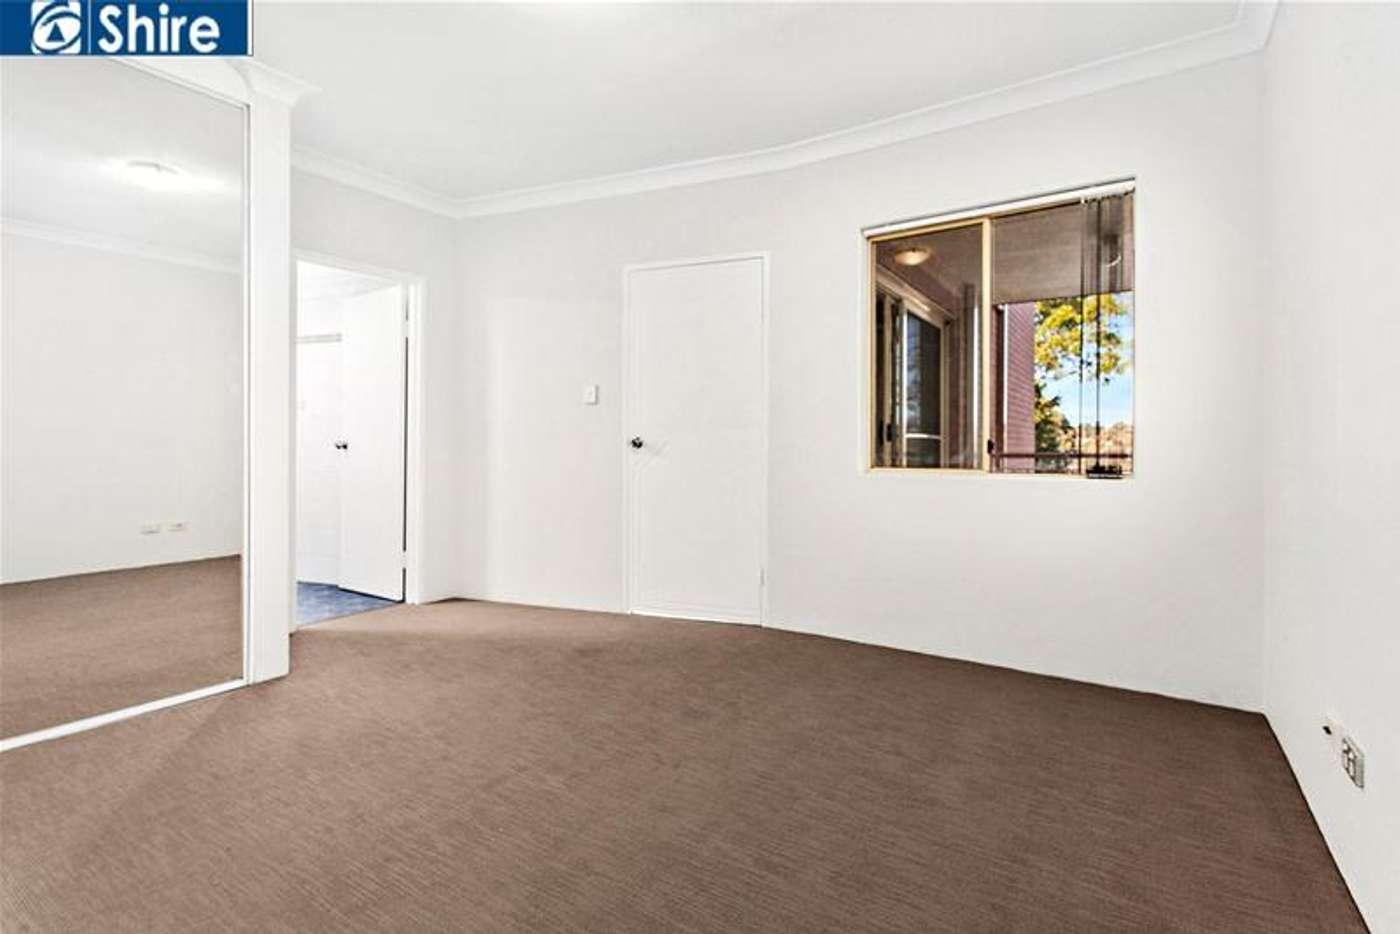 Sixth view of Homely apartment listing, 6/8-14 Gibbs Street, Miranda NSW 2228